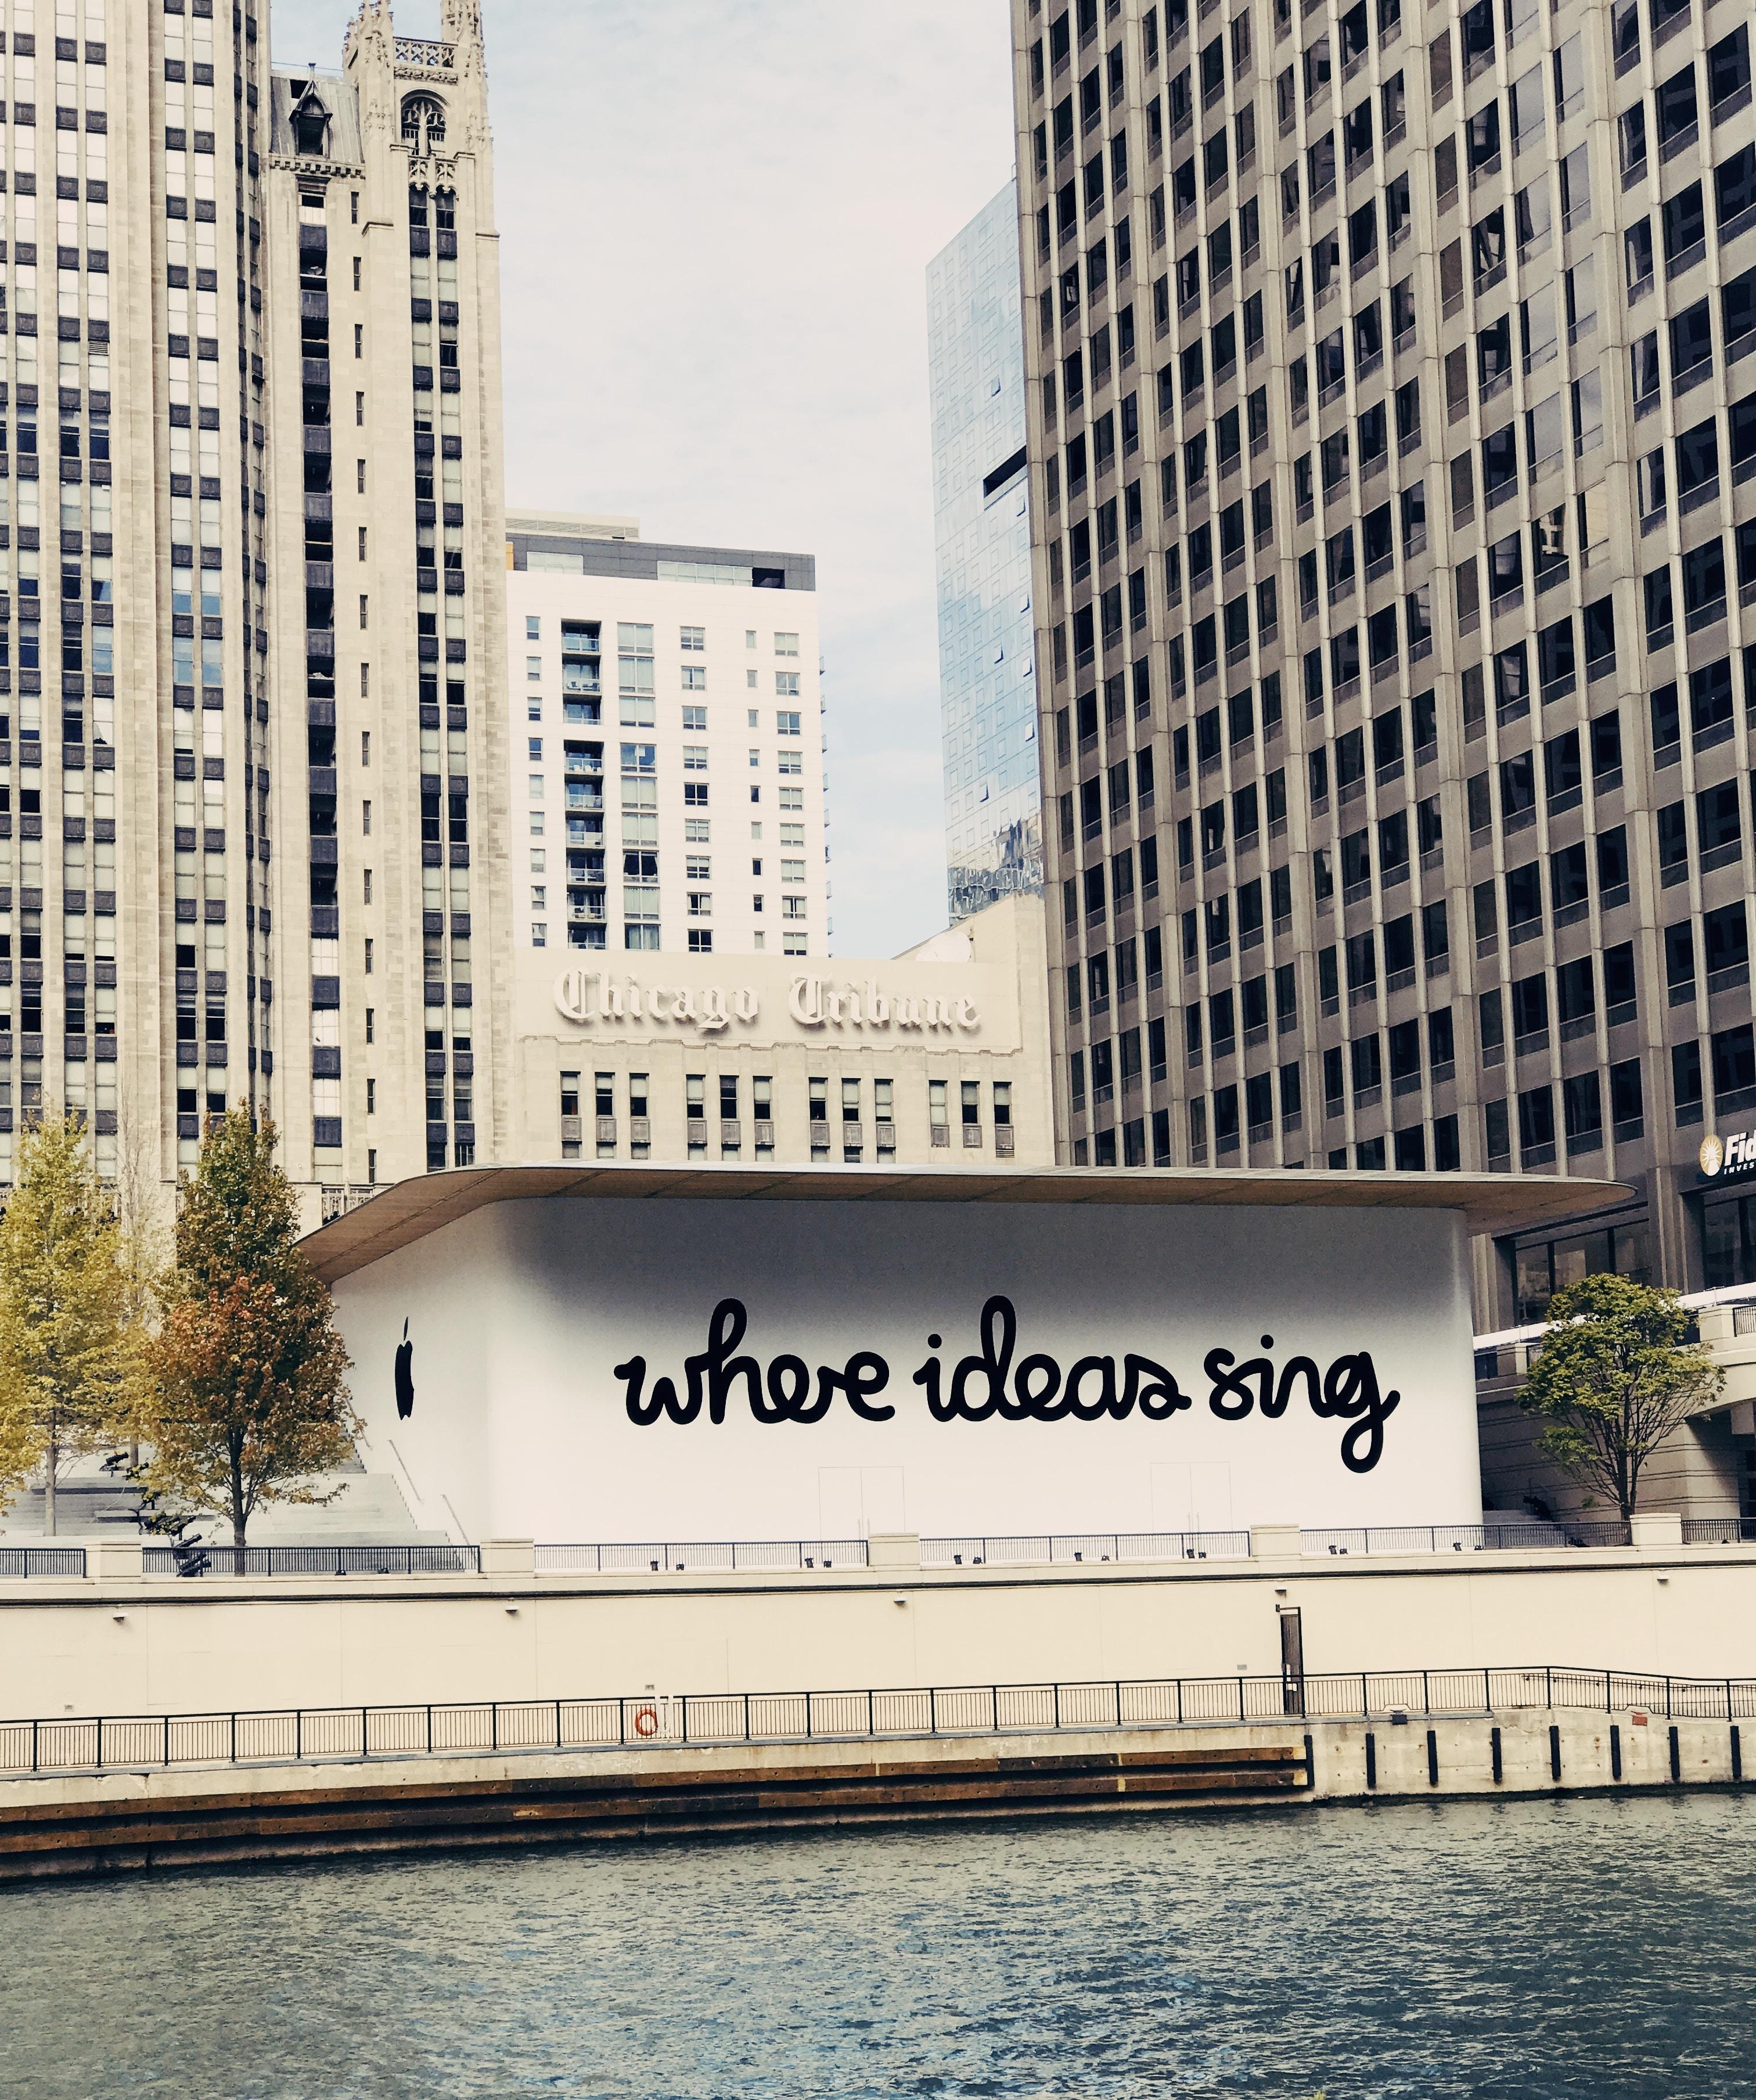 white concrete building near body of water